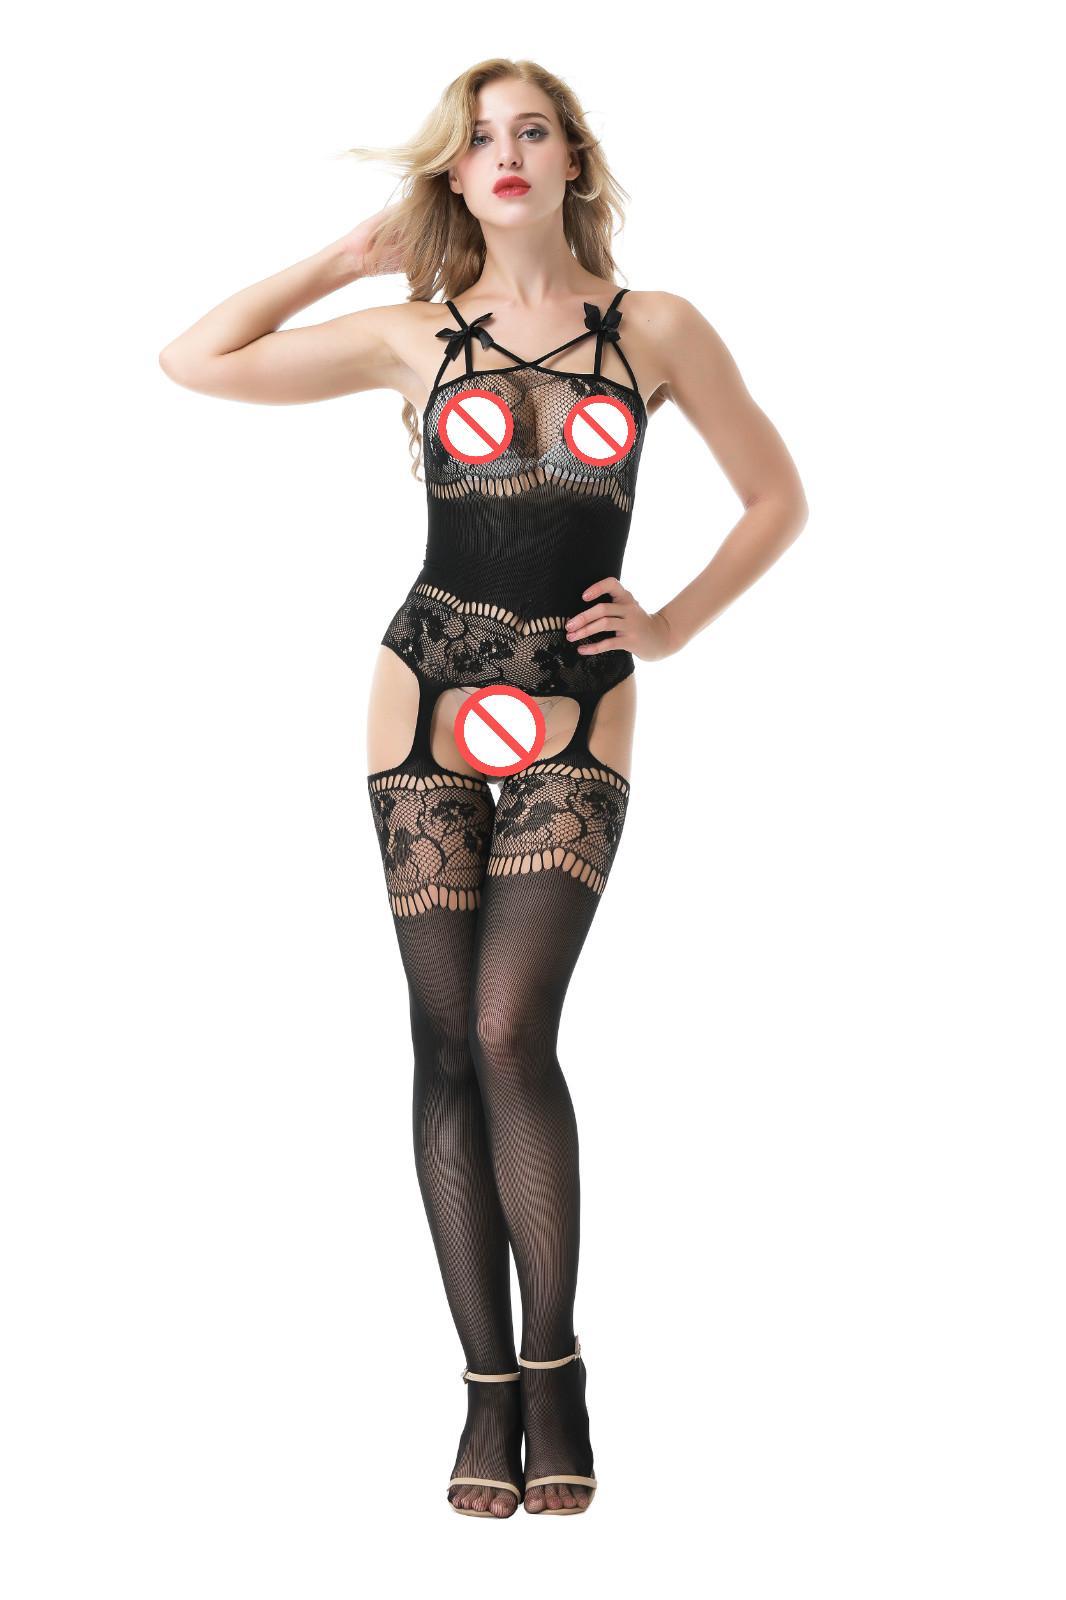 b91109a72b 2019 New Arrival Black Hollow Women Lingerie Sexi Socks Sexy Bodystockings  Dress Langerie Bow Underwear Lenceria Sexy Costumes Bodysocks Pjs From  Xiexiepei